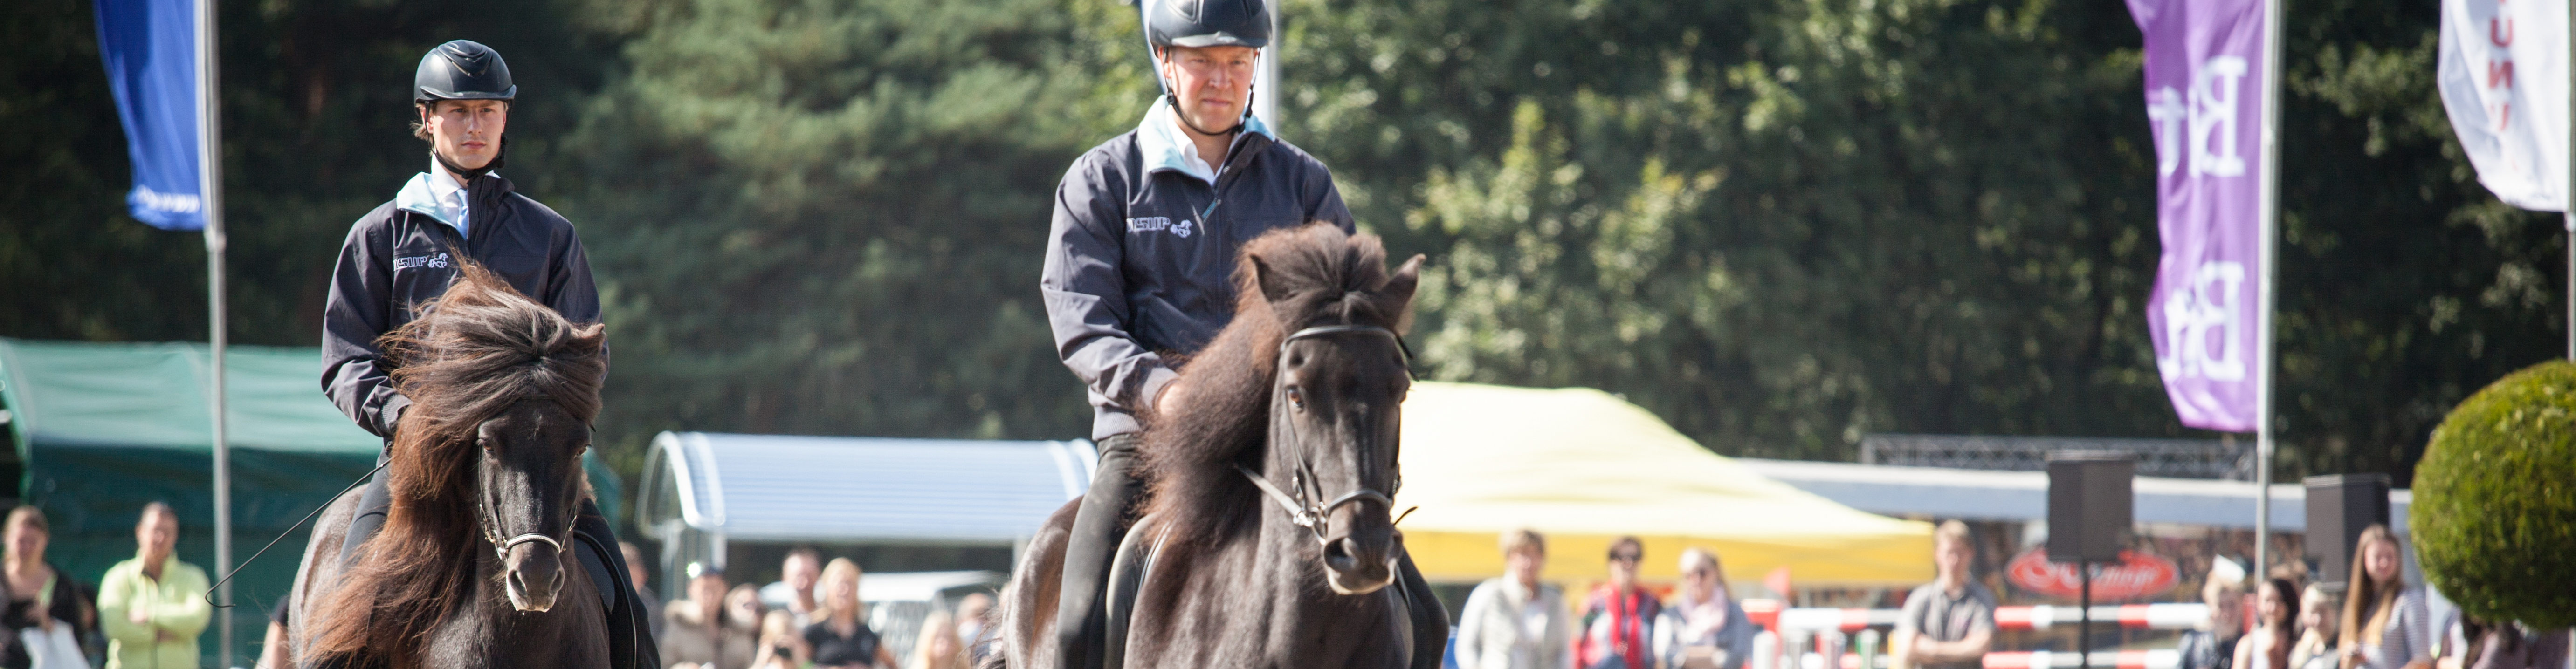 IJslandse Paard-HEADER